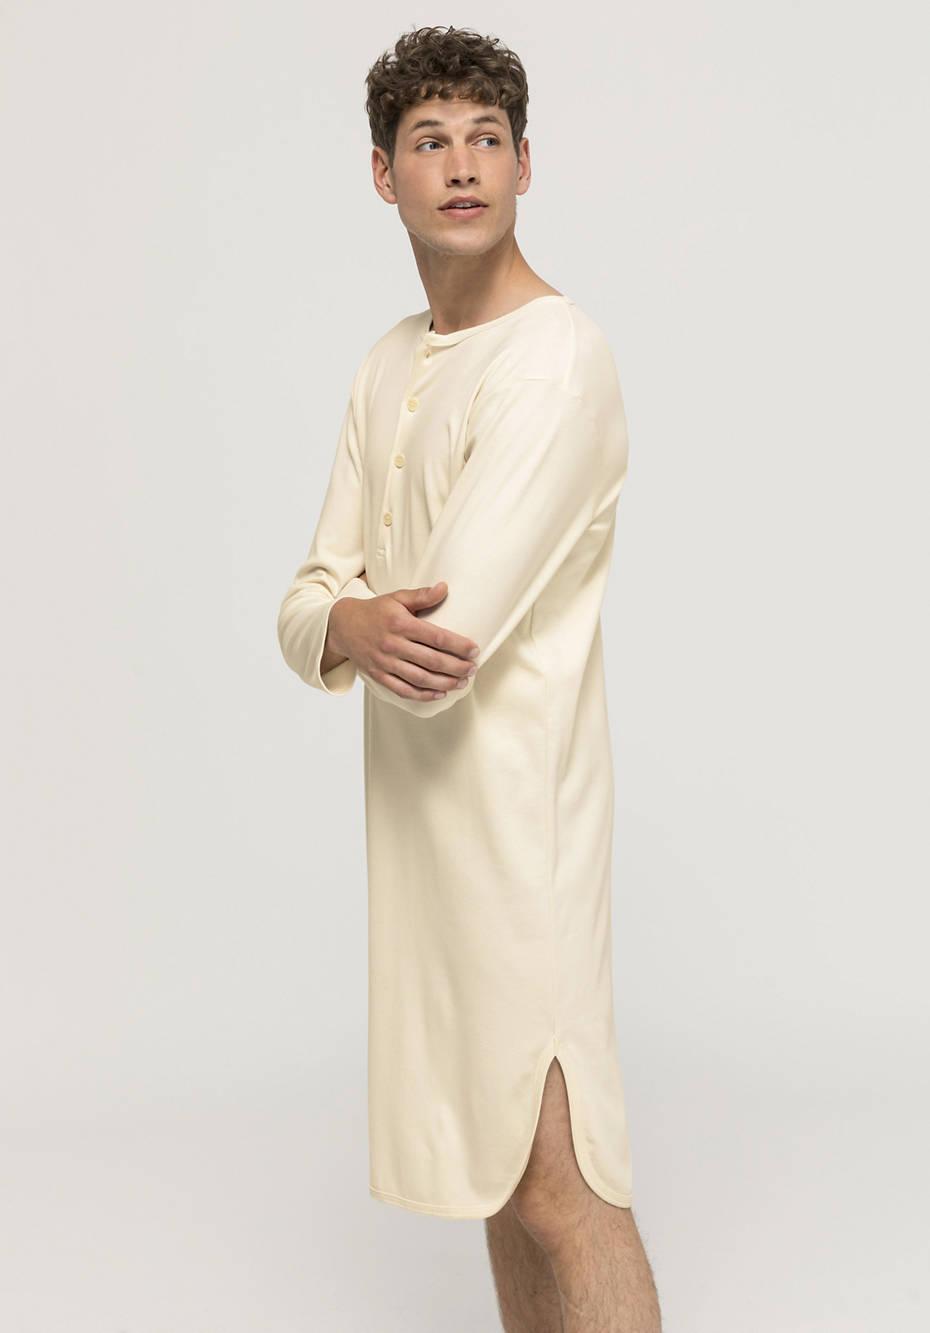 PureNATURE sleep shirt made of pure organic cotton